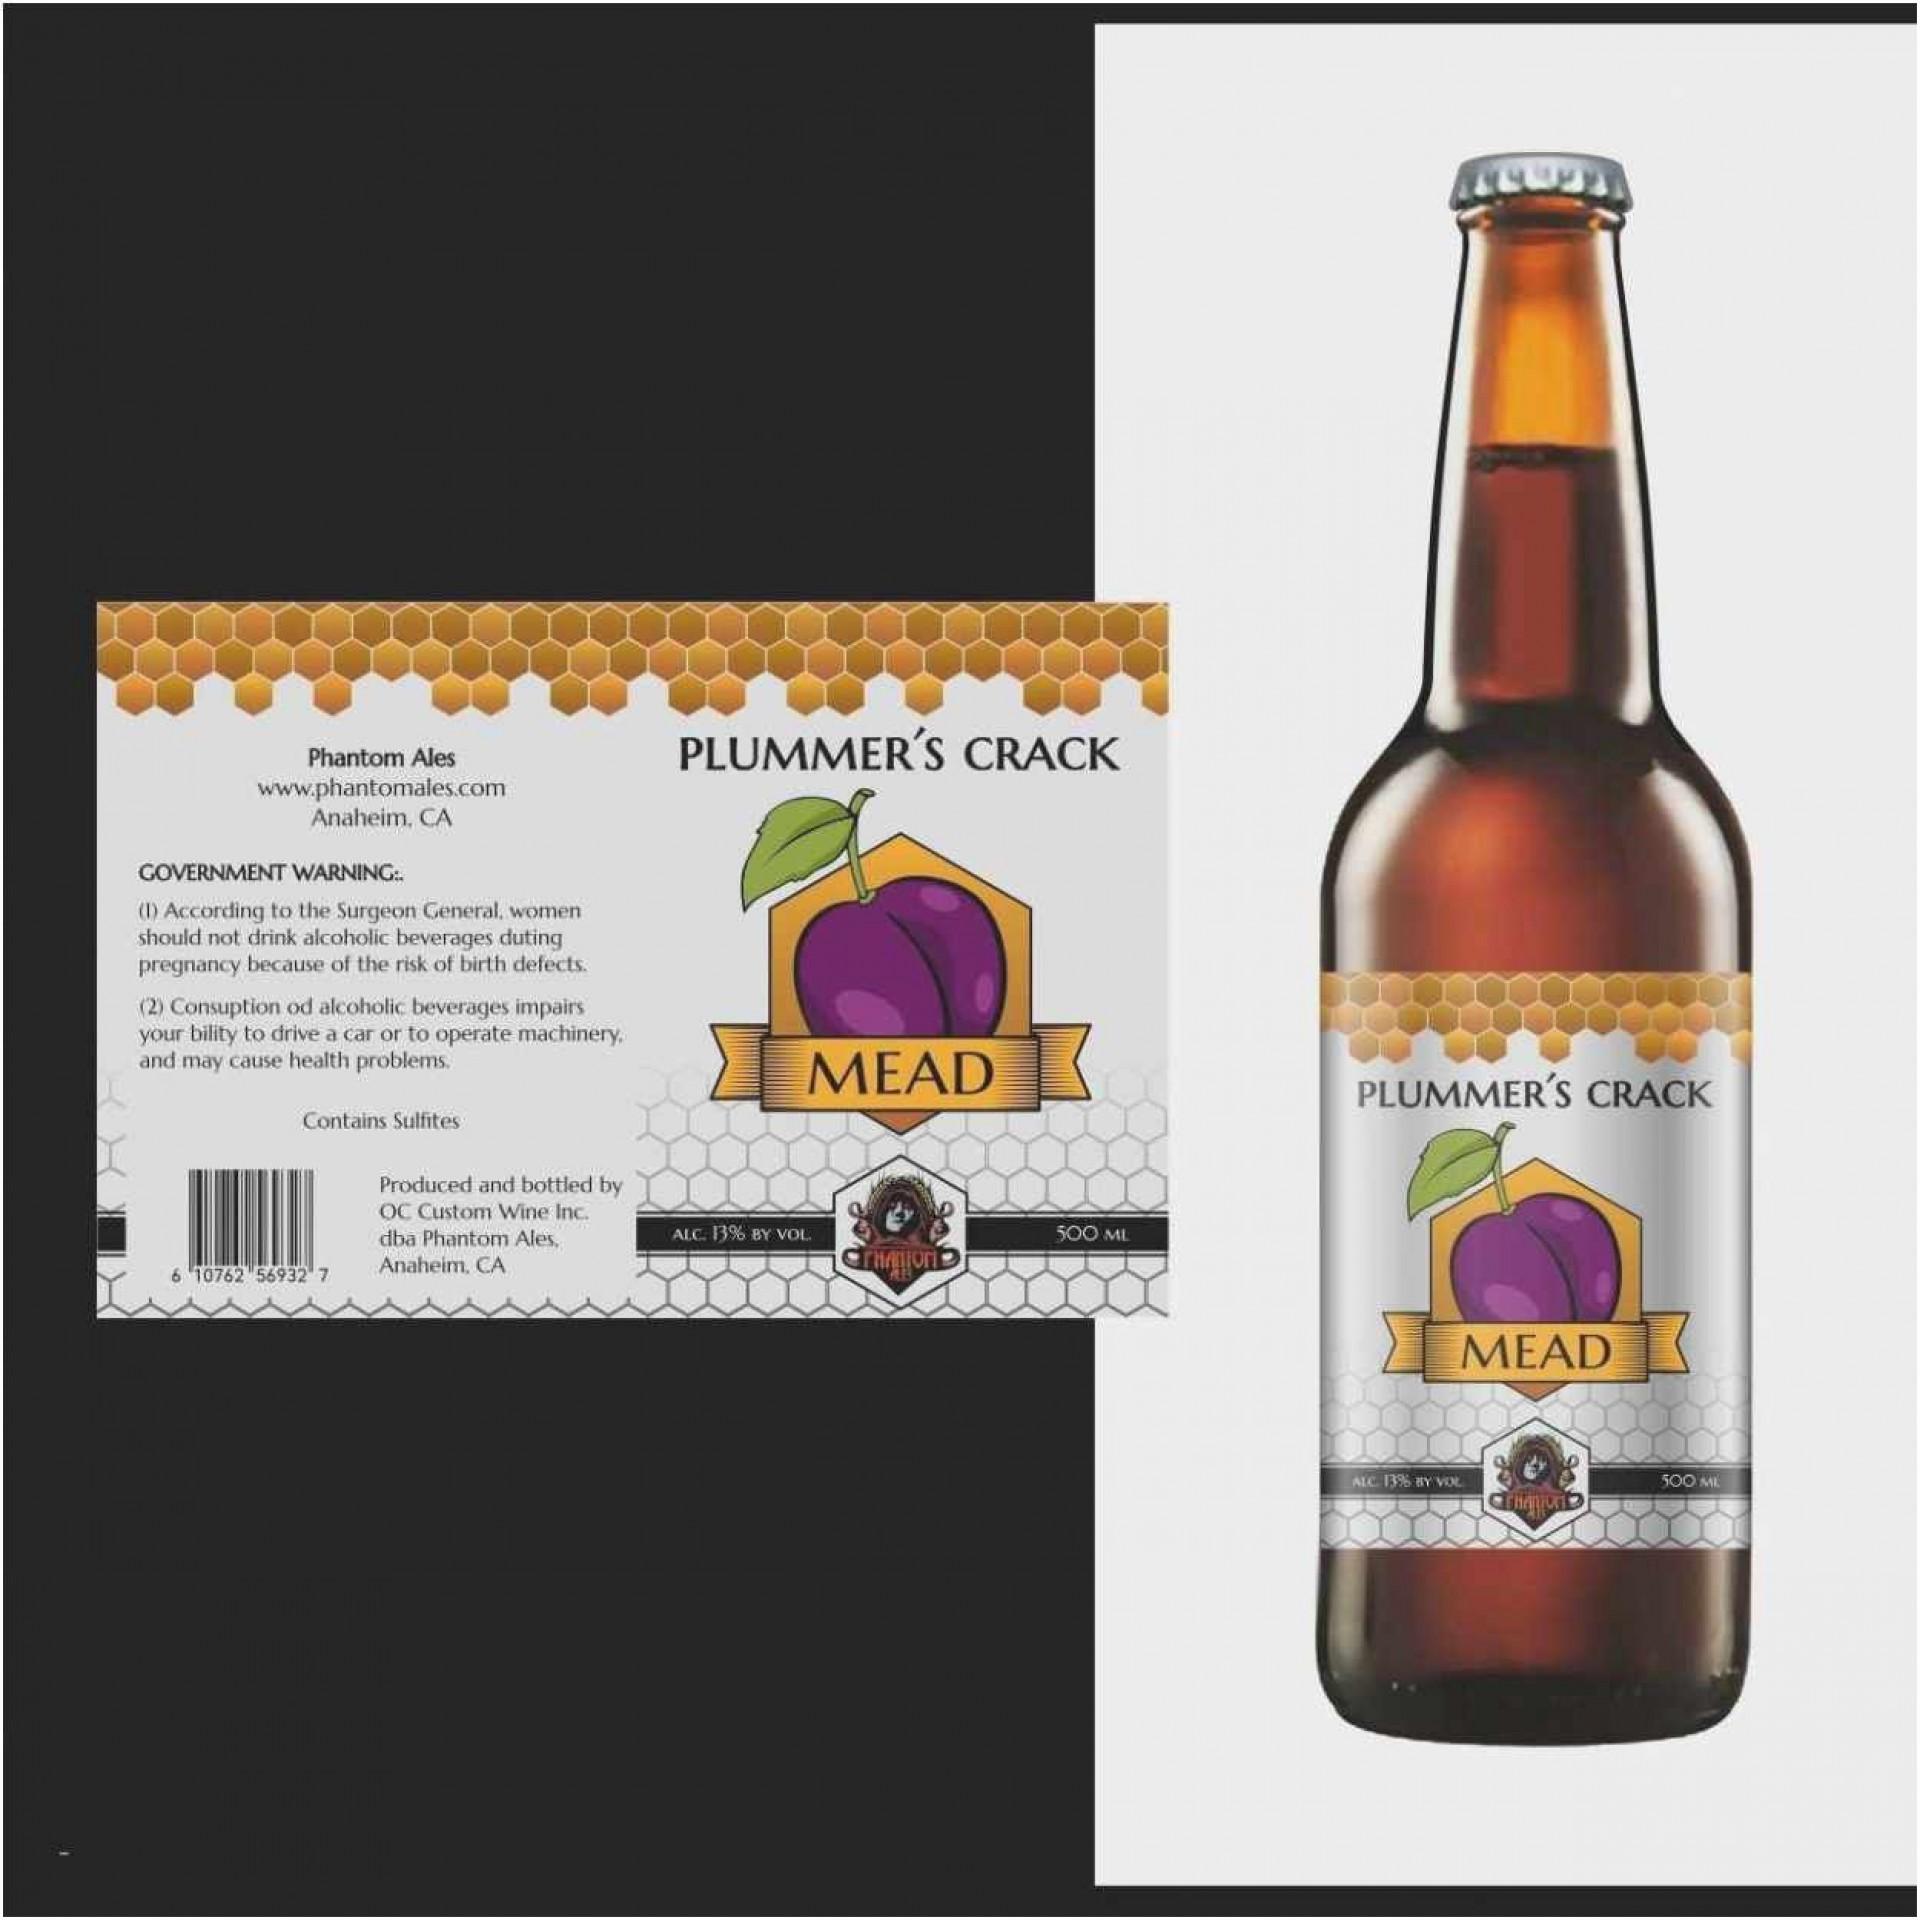 001 Fearsome Beer Label Template Word Idea  Free Bottle Microsoft1920